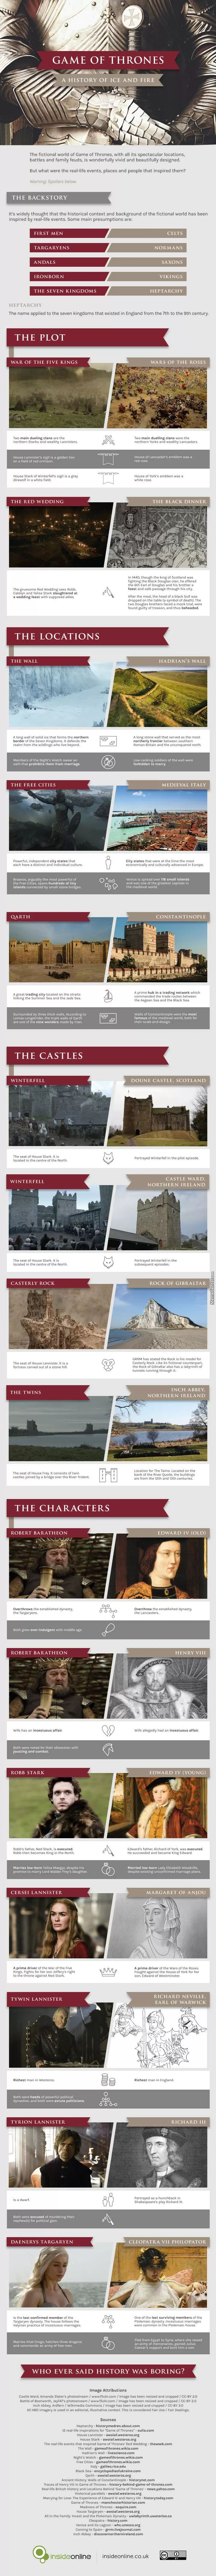 Game Of Thrones Plot v History